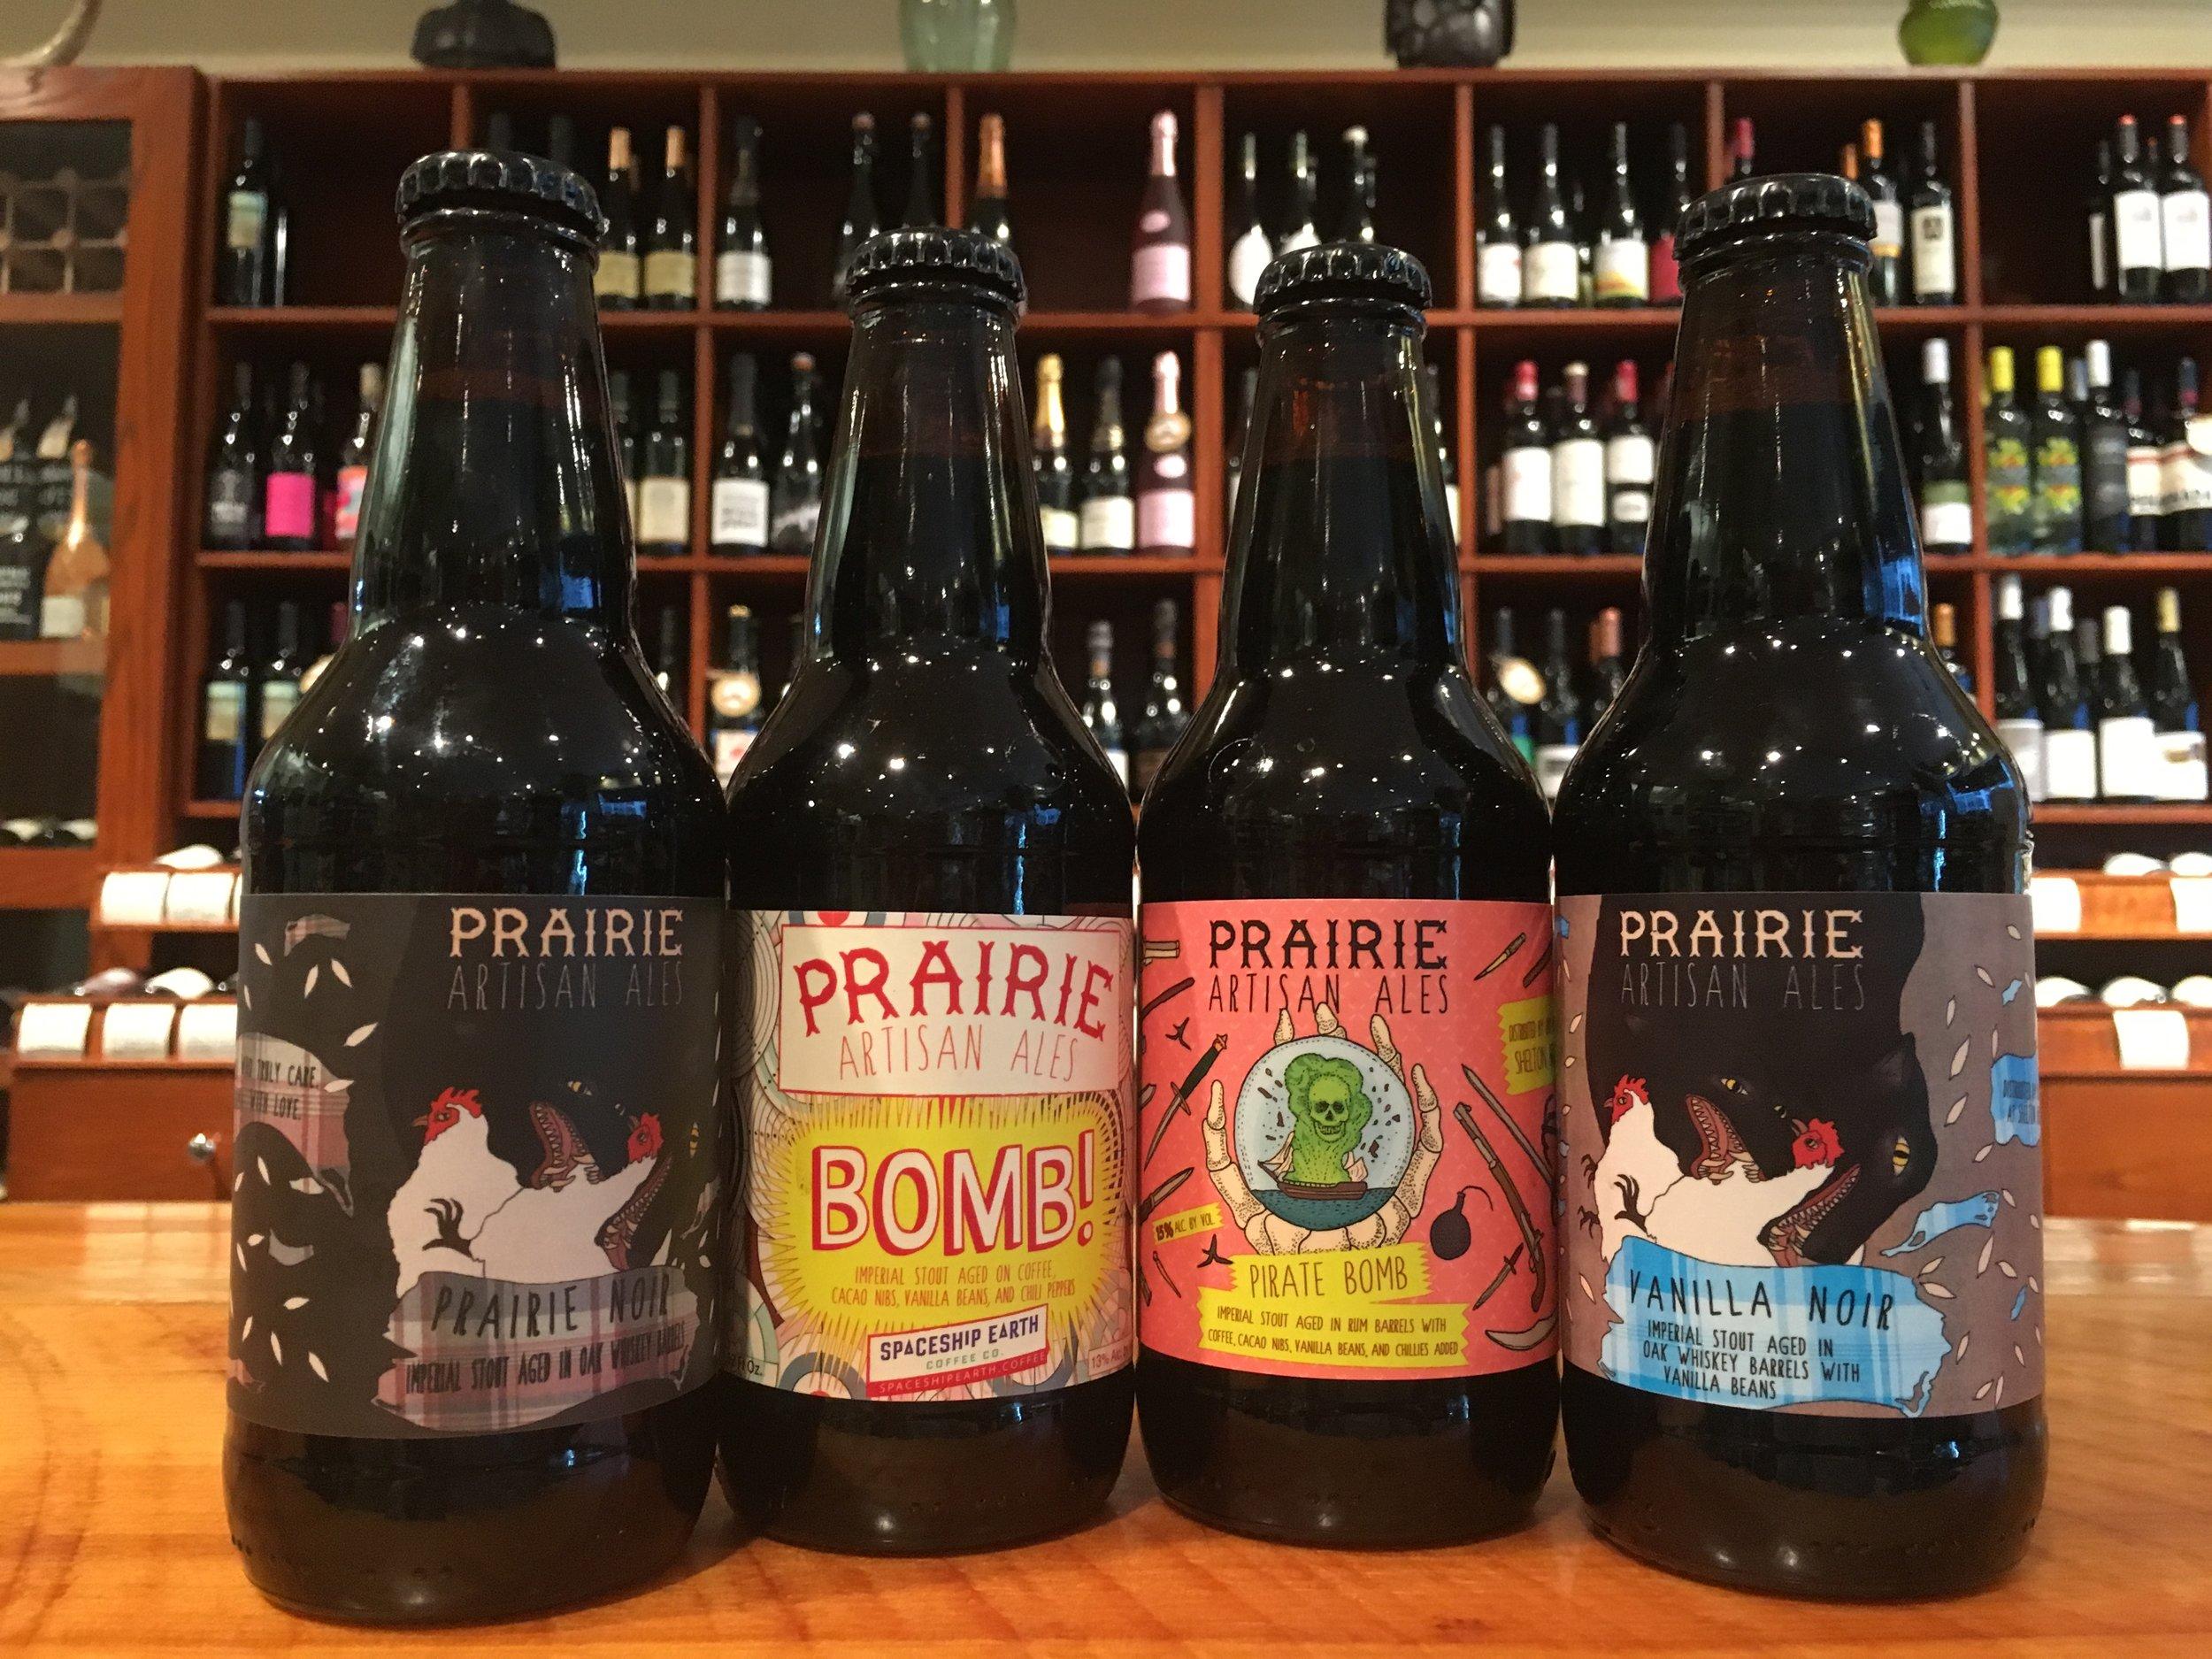 From left: Prairie Noir, Prairie Bomb!, Pirate Bomb!, Vanilla Noir